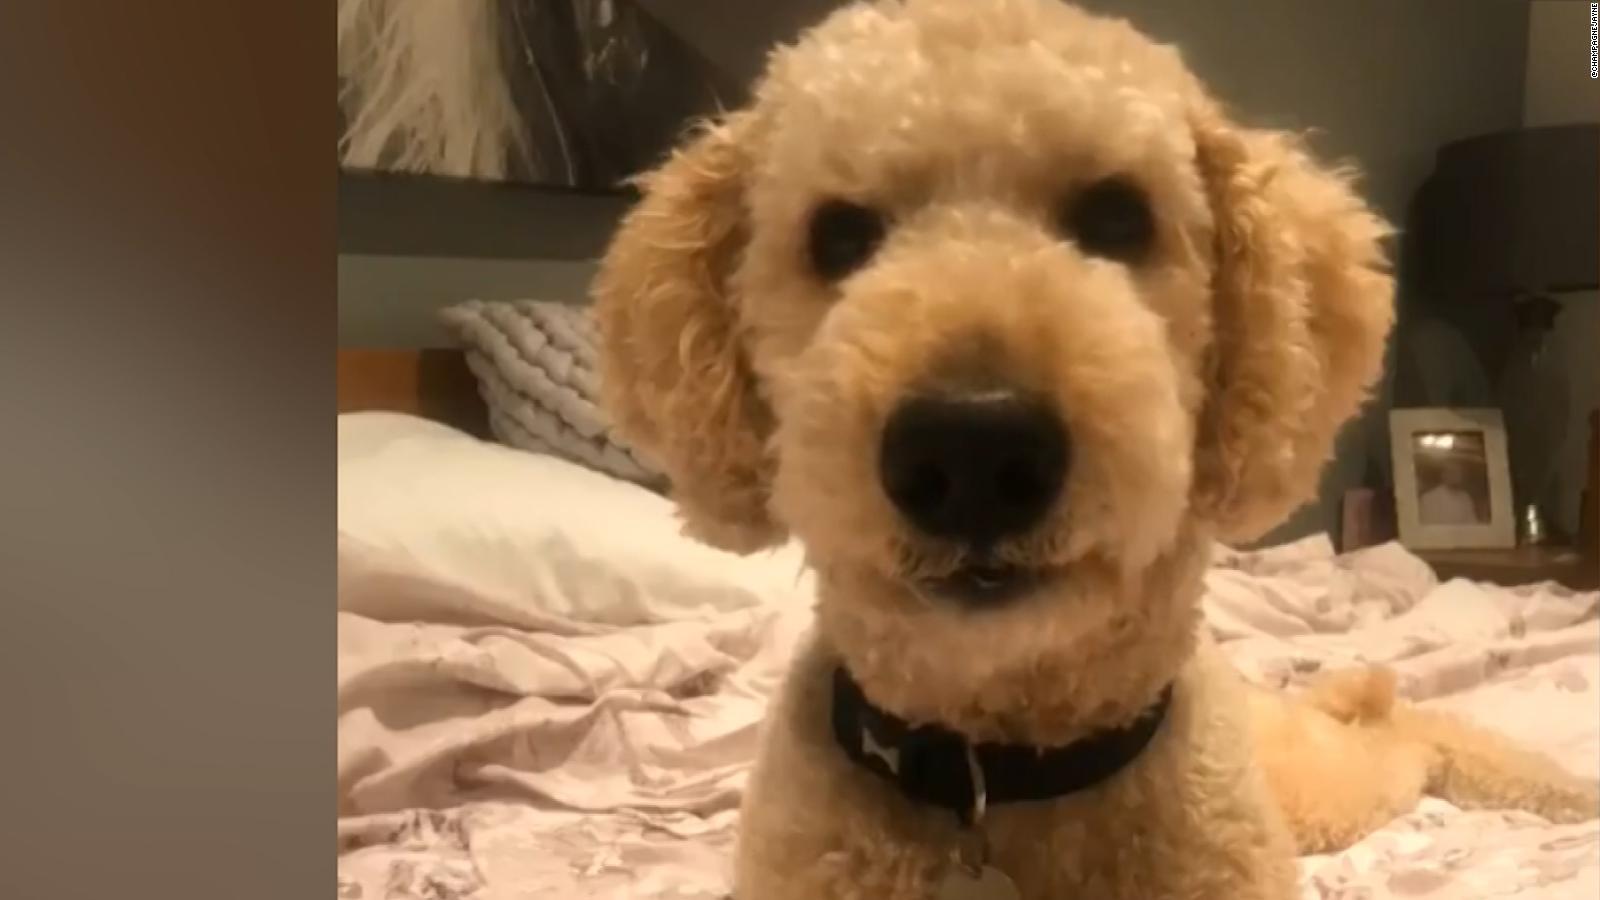 Watch Hilarious Talking Dog Meme About Quarantine Cnn Video